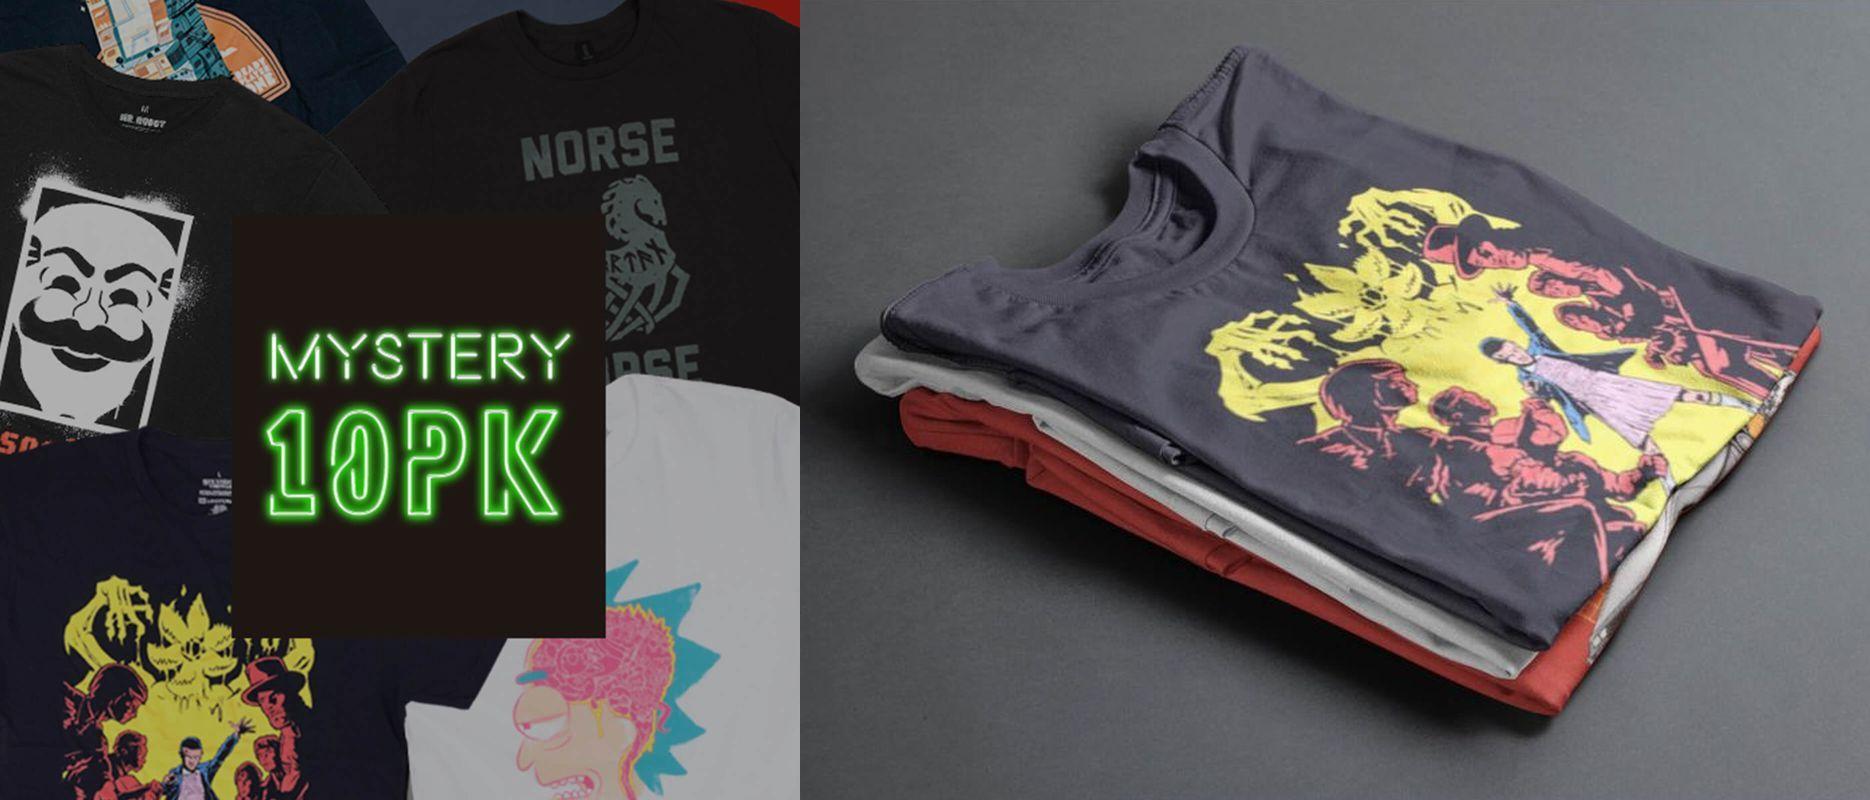 Modern Myths Merchandise – Black Friday 2019 - Mystery Geeky Shirts 10 Pack 1 en 2